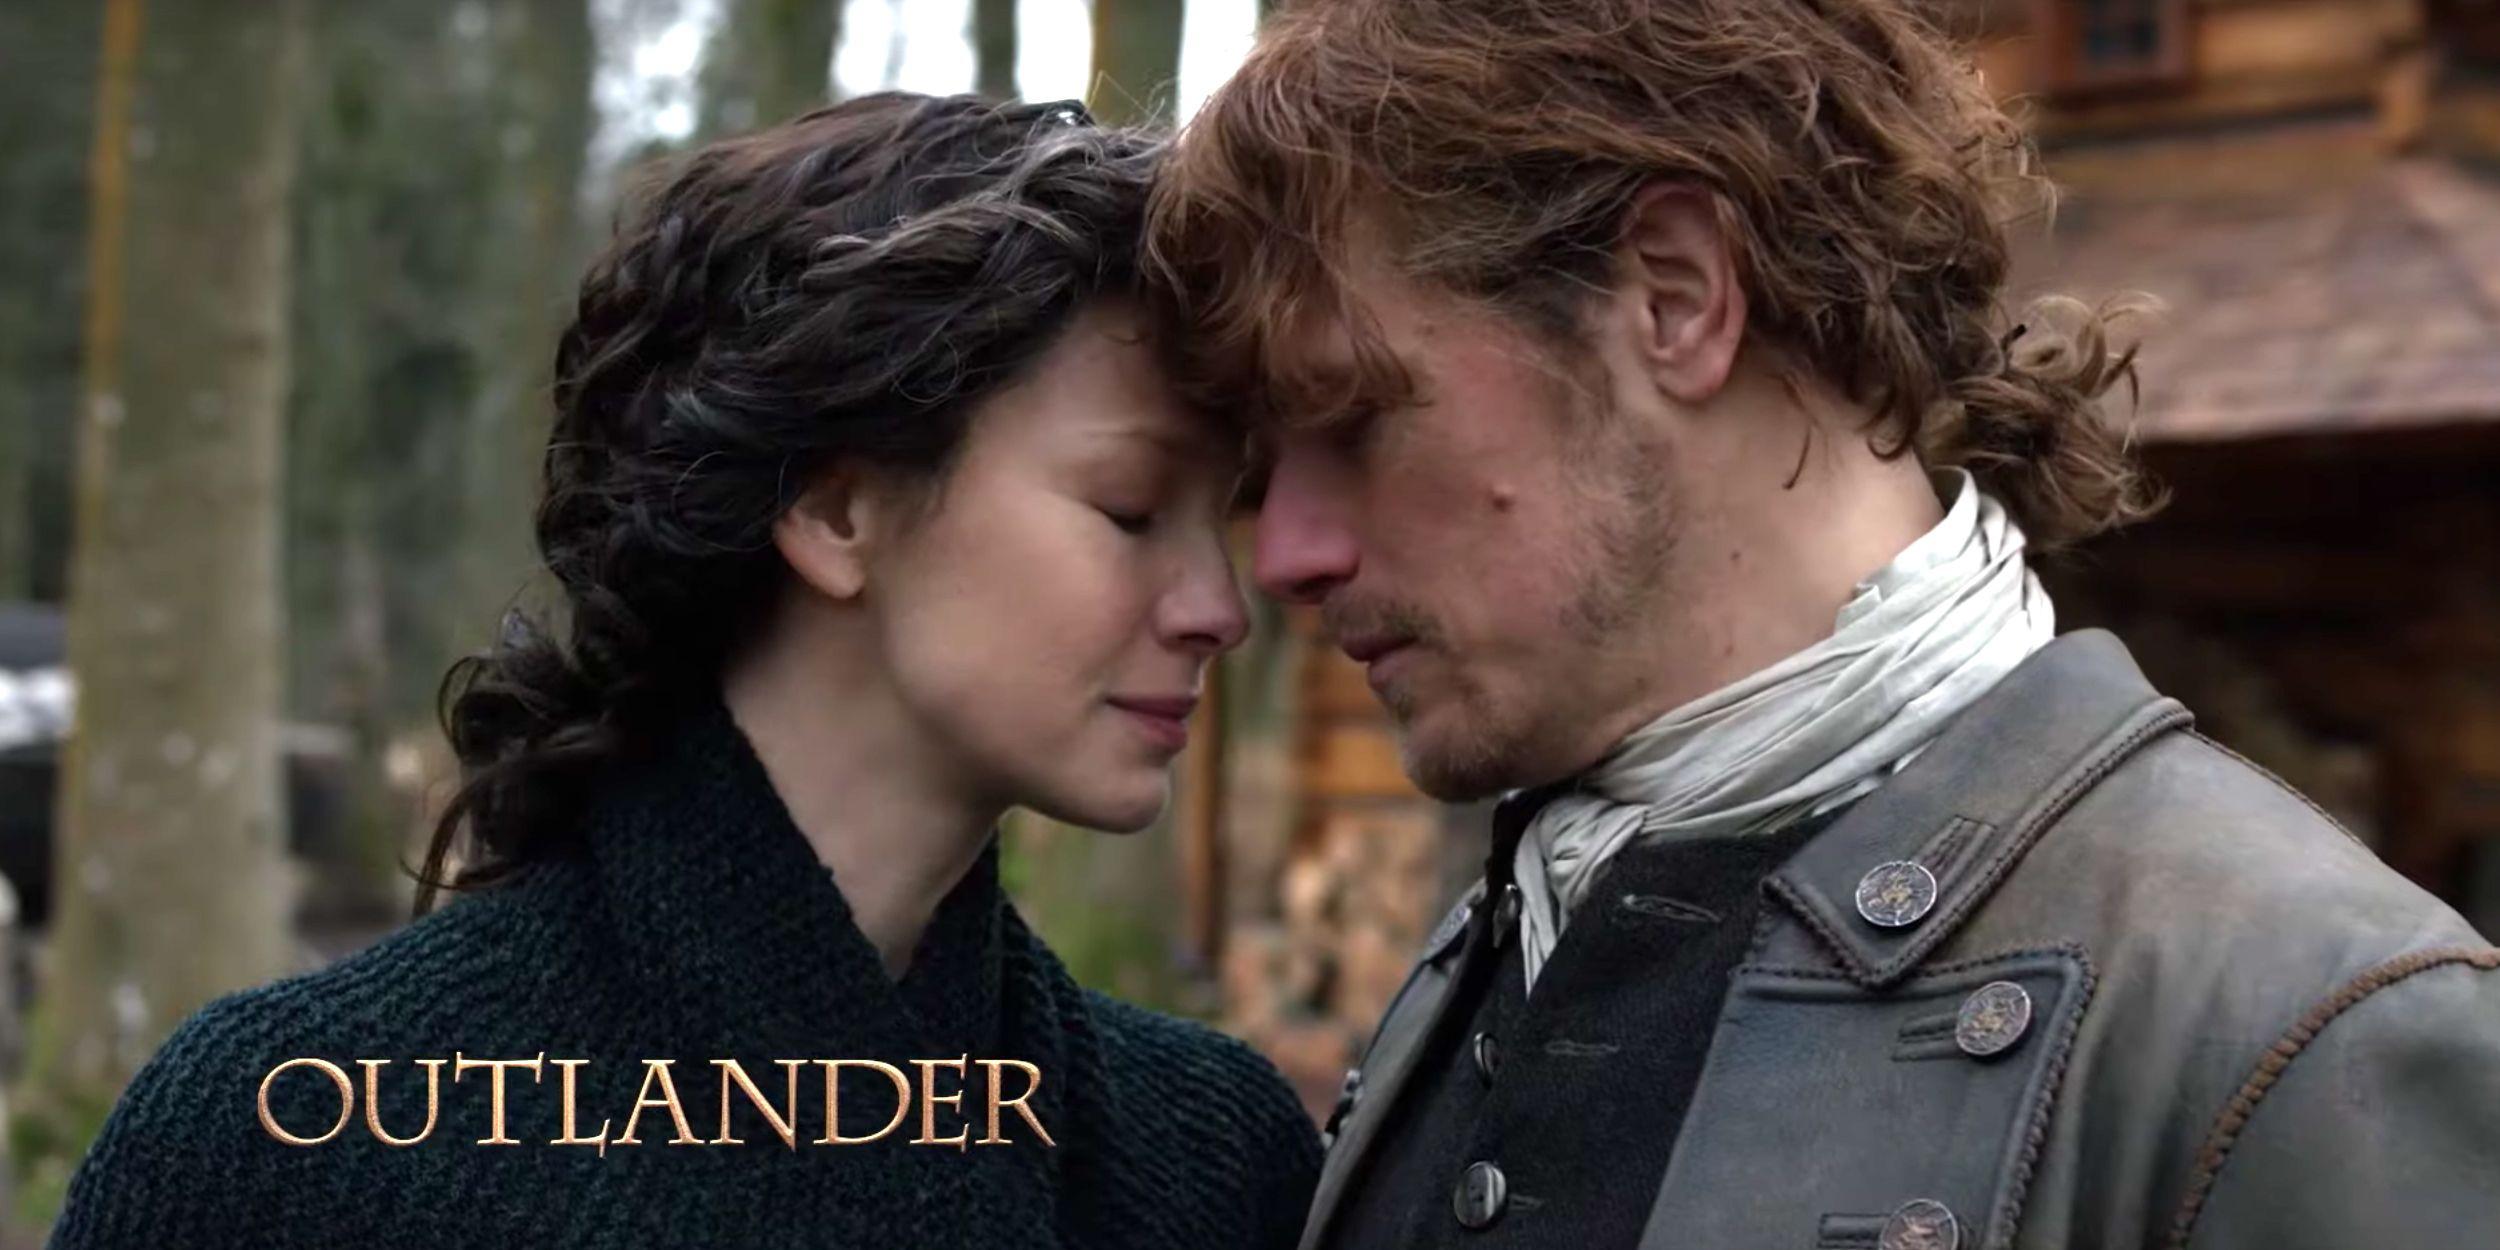 Outlander Season 5 Spoilers, Rumors, Release Date, Plot and